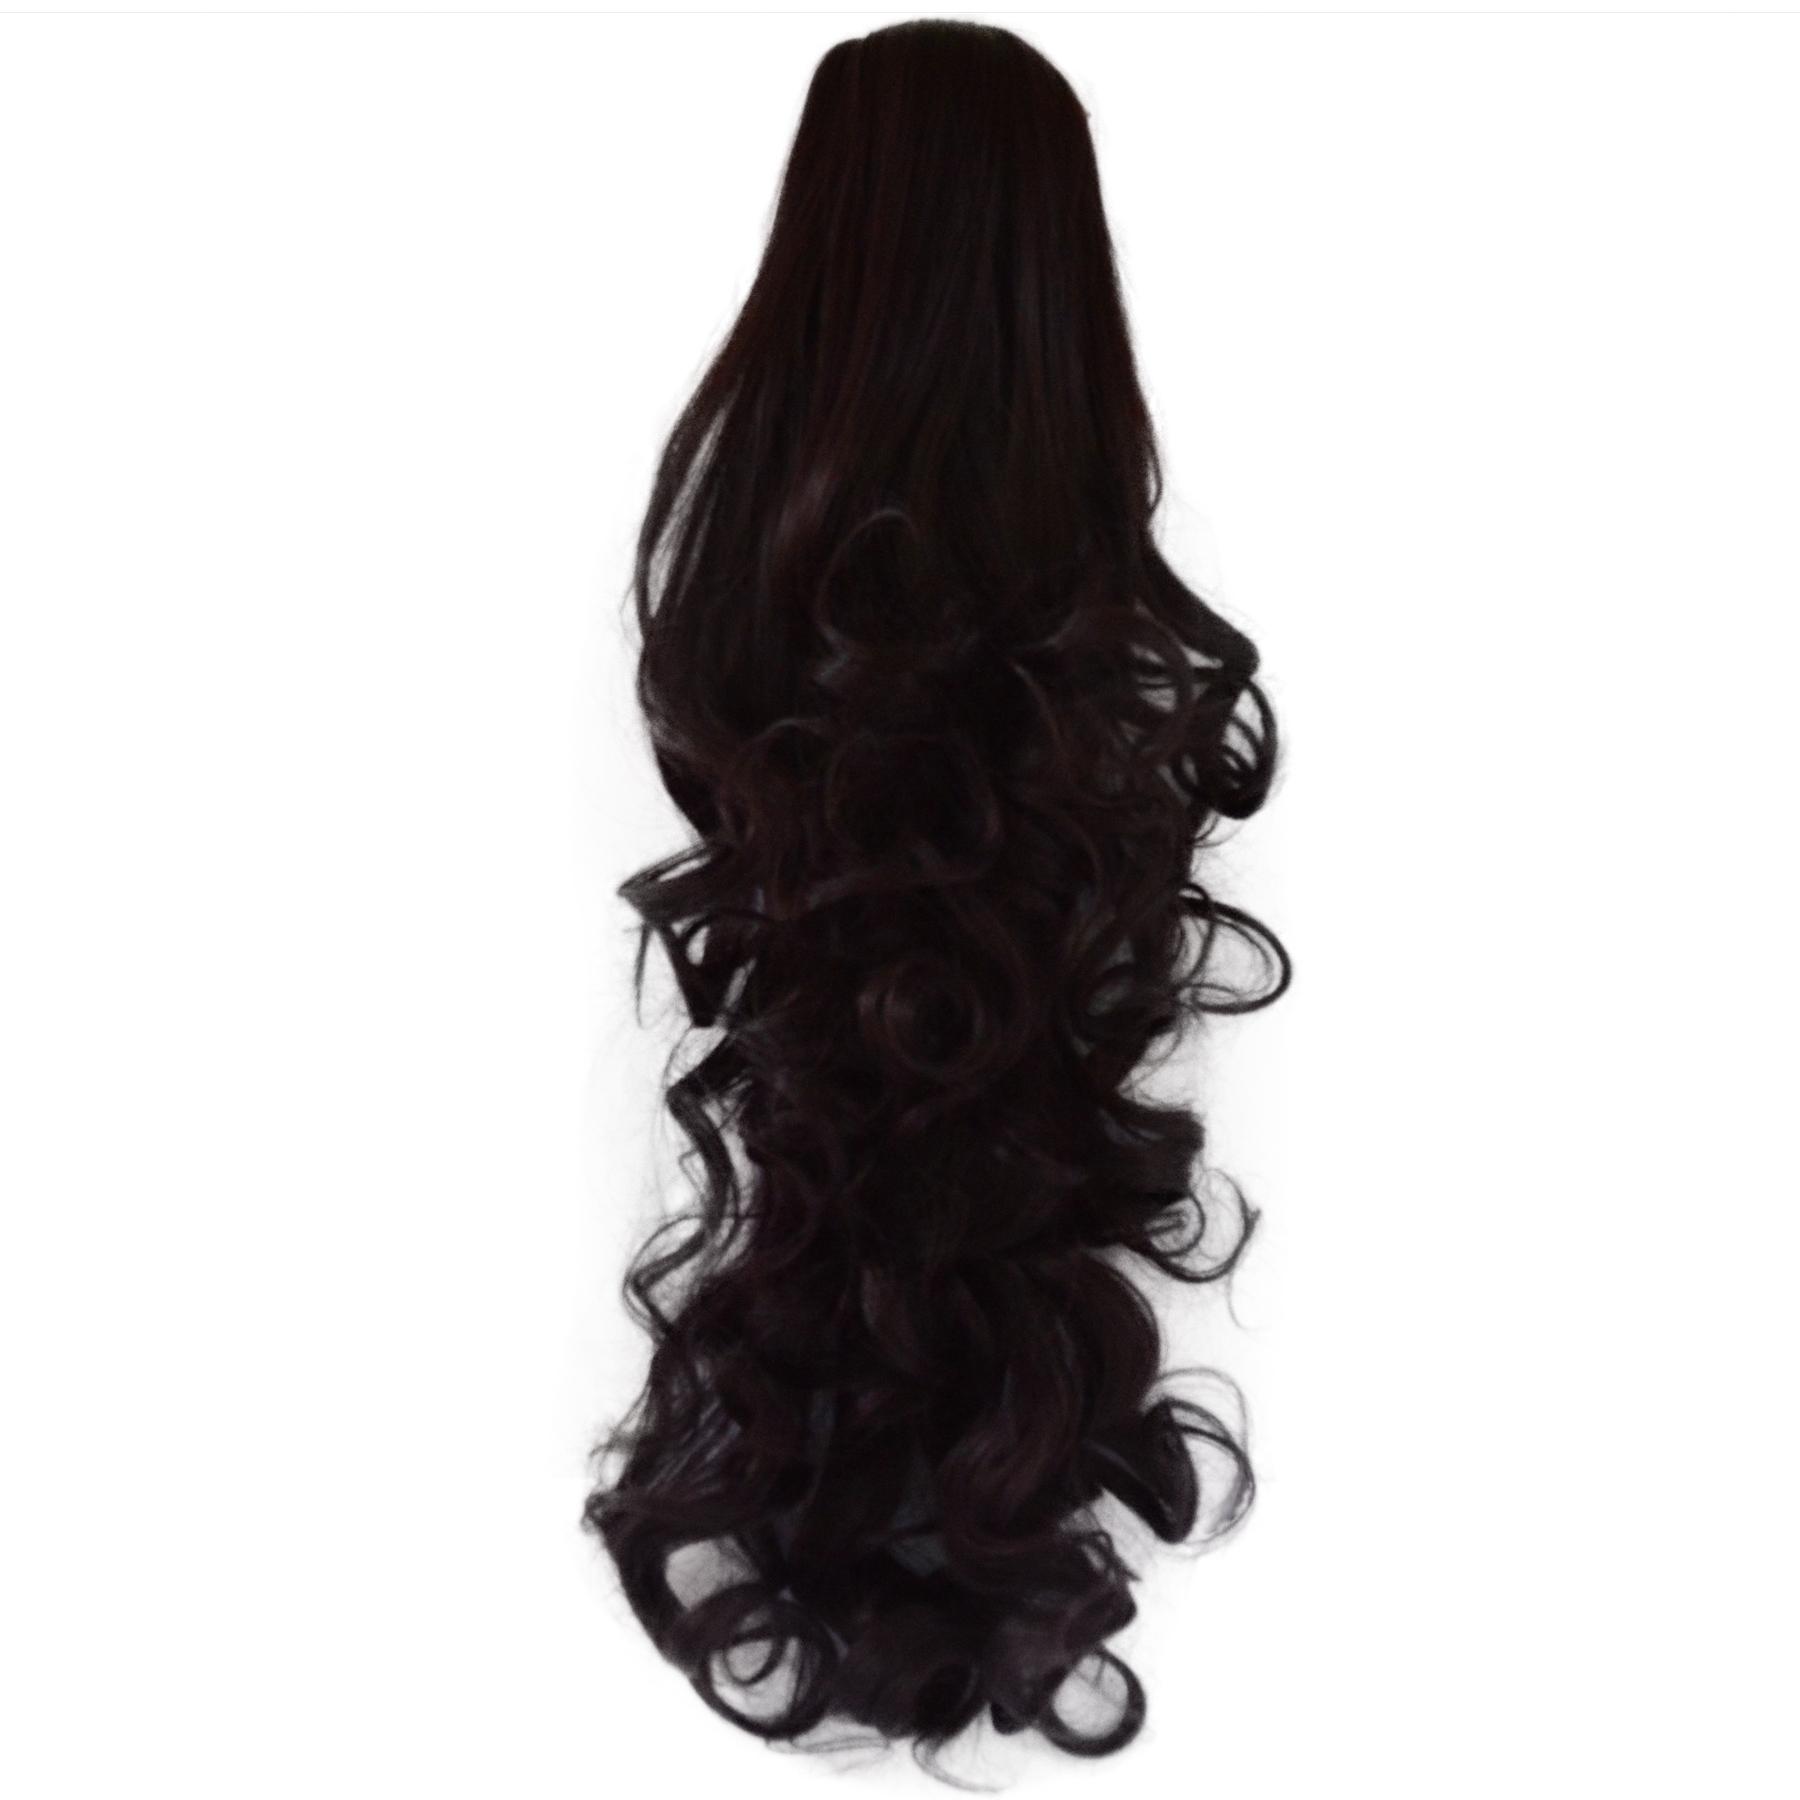 22 Ponytail Clip In Hair Extensions Falling Curls Dark Plum 99j1